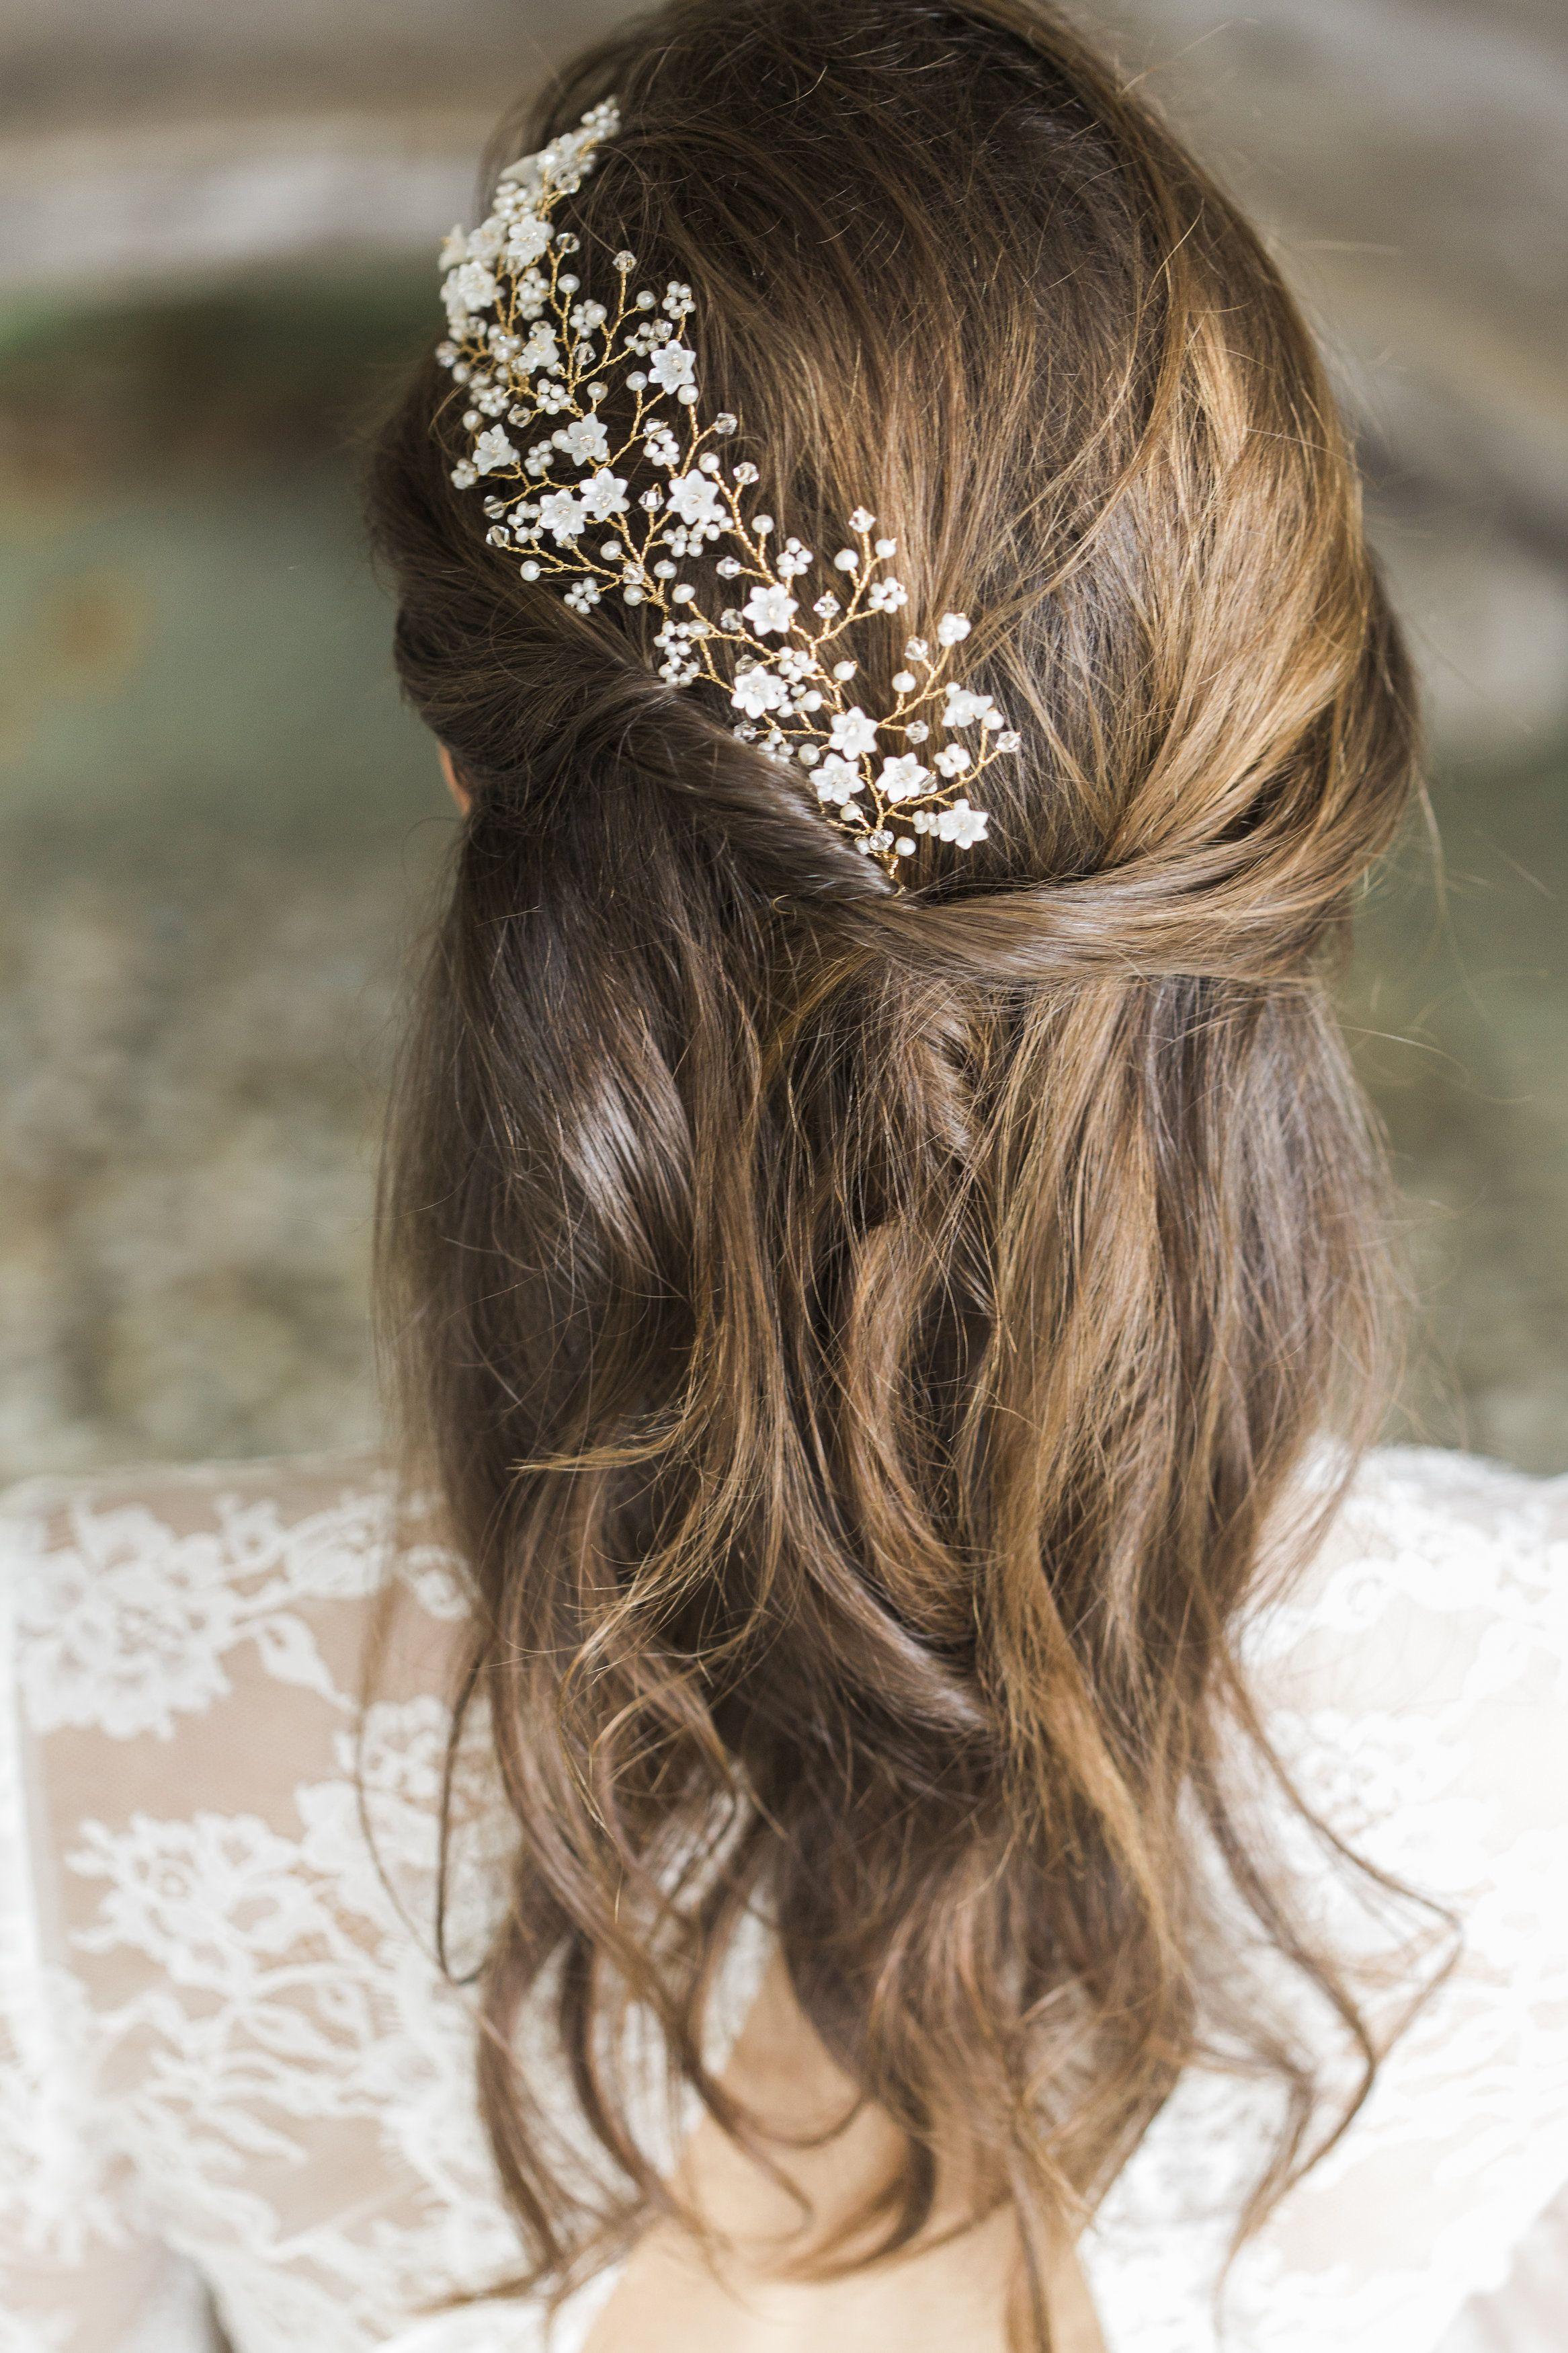 hermione harbutt violette hairpins | amy fanton photography